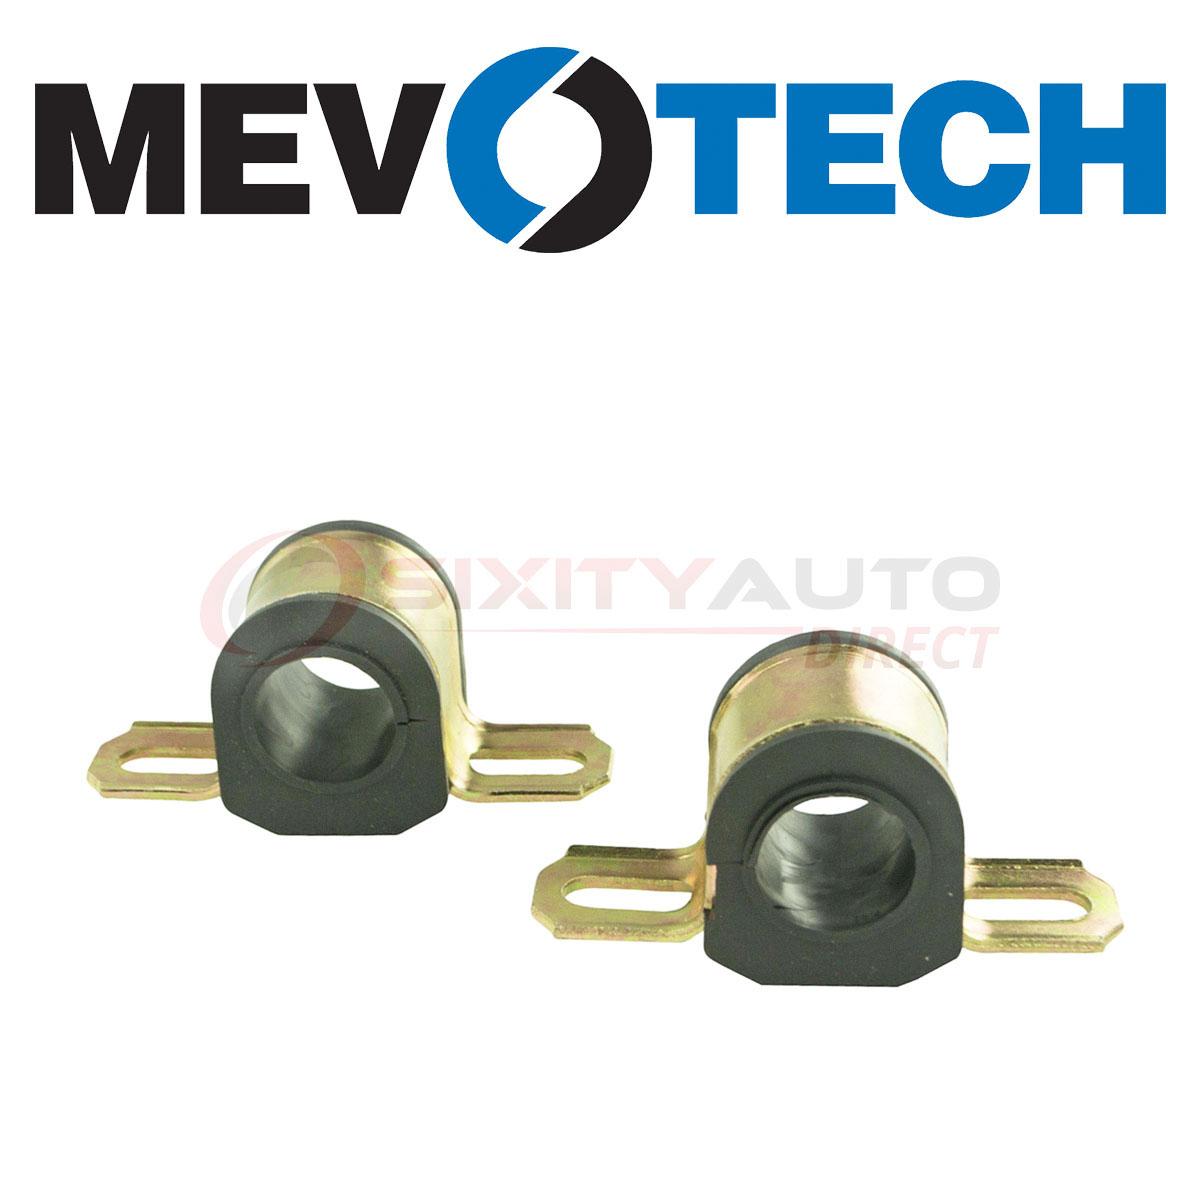 Mevotech Front To Frame Stabilizer Bar Bushing Kit for 1975-1986 Chevrolet am